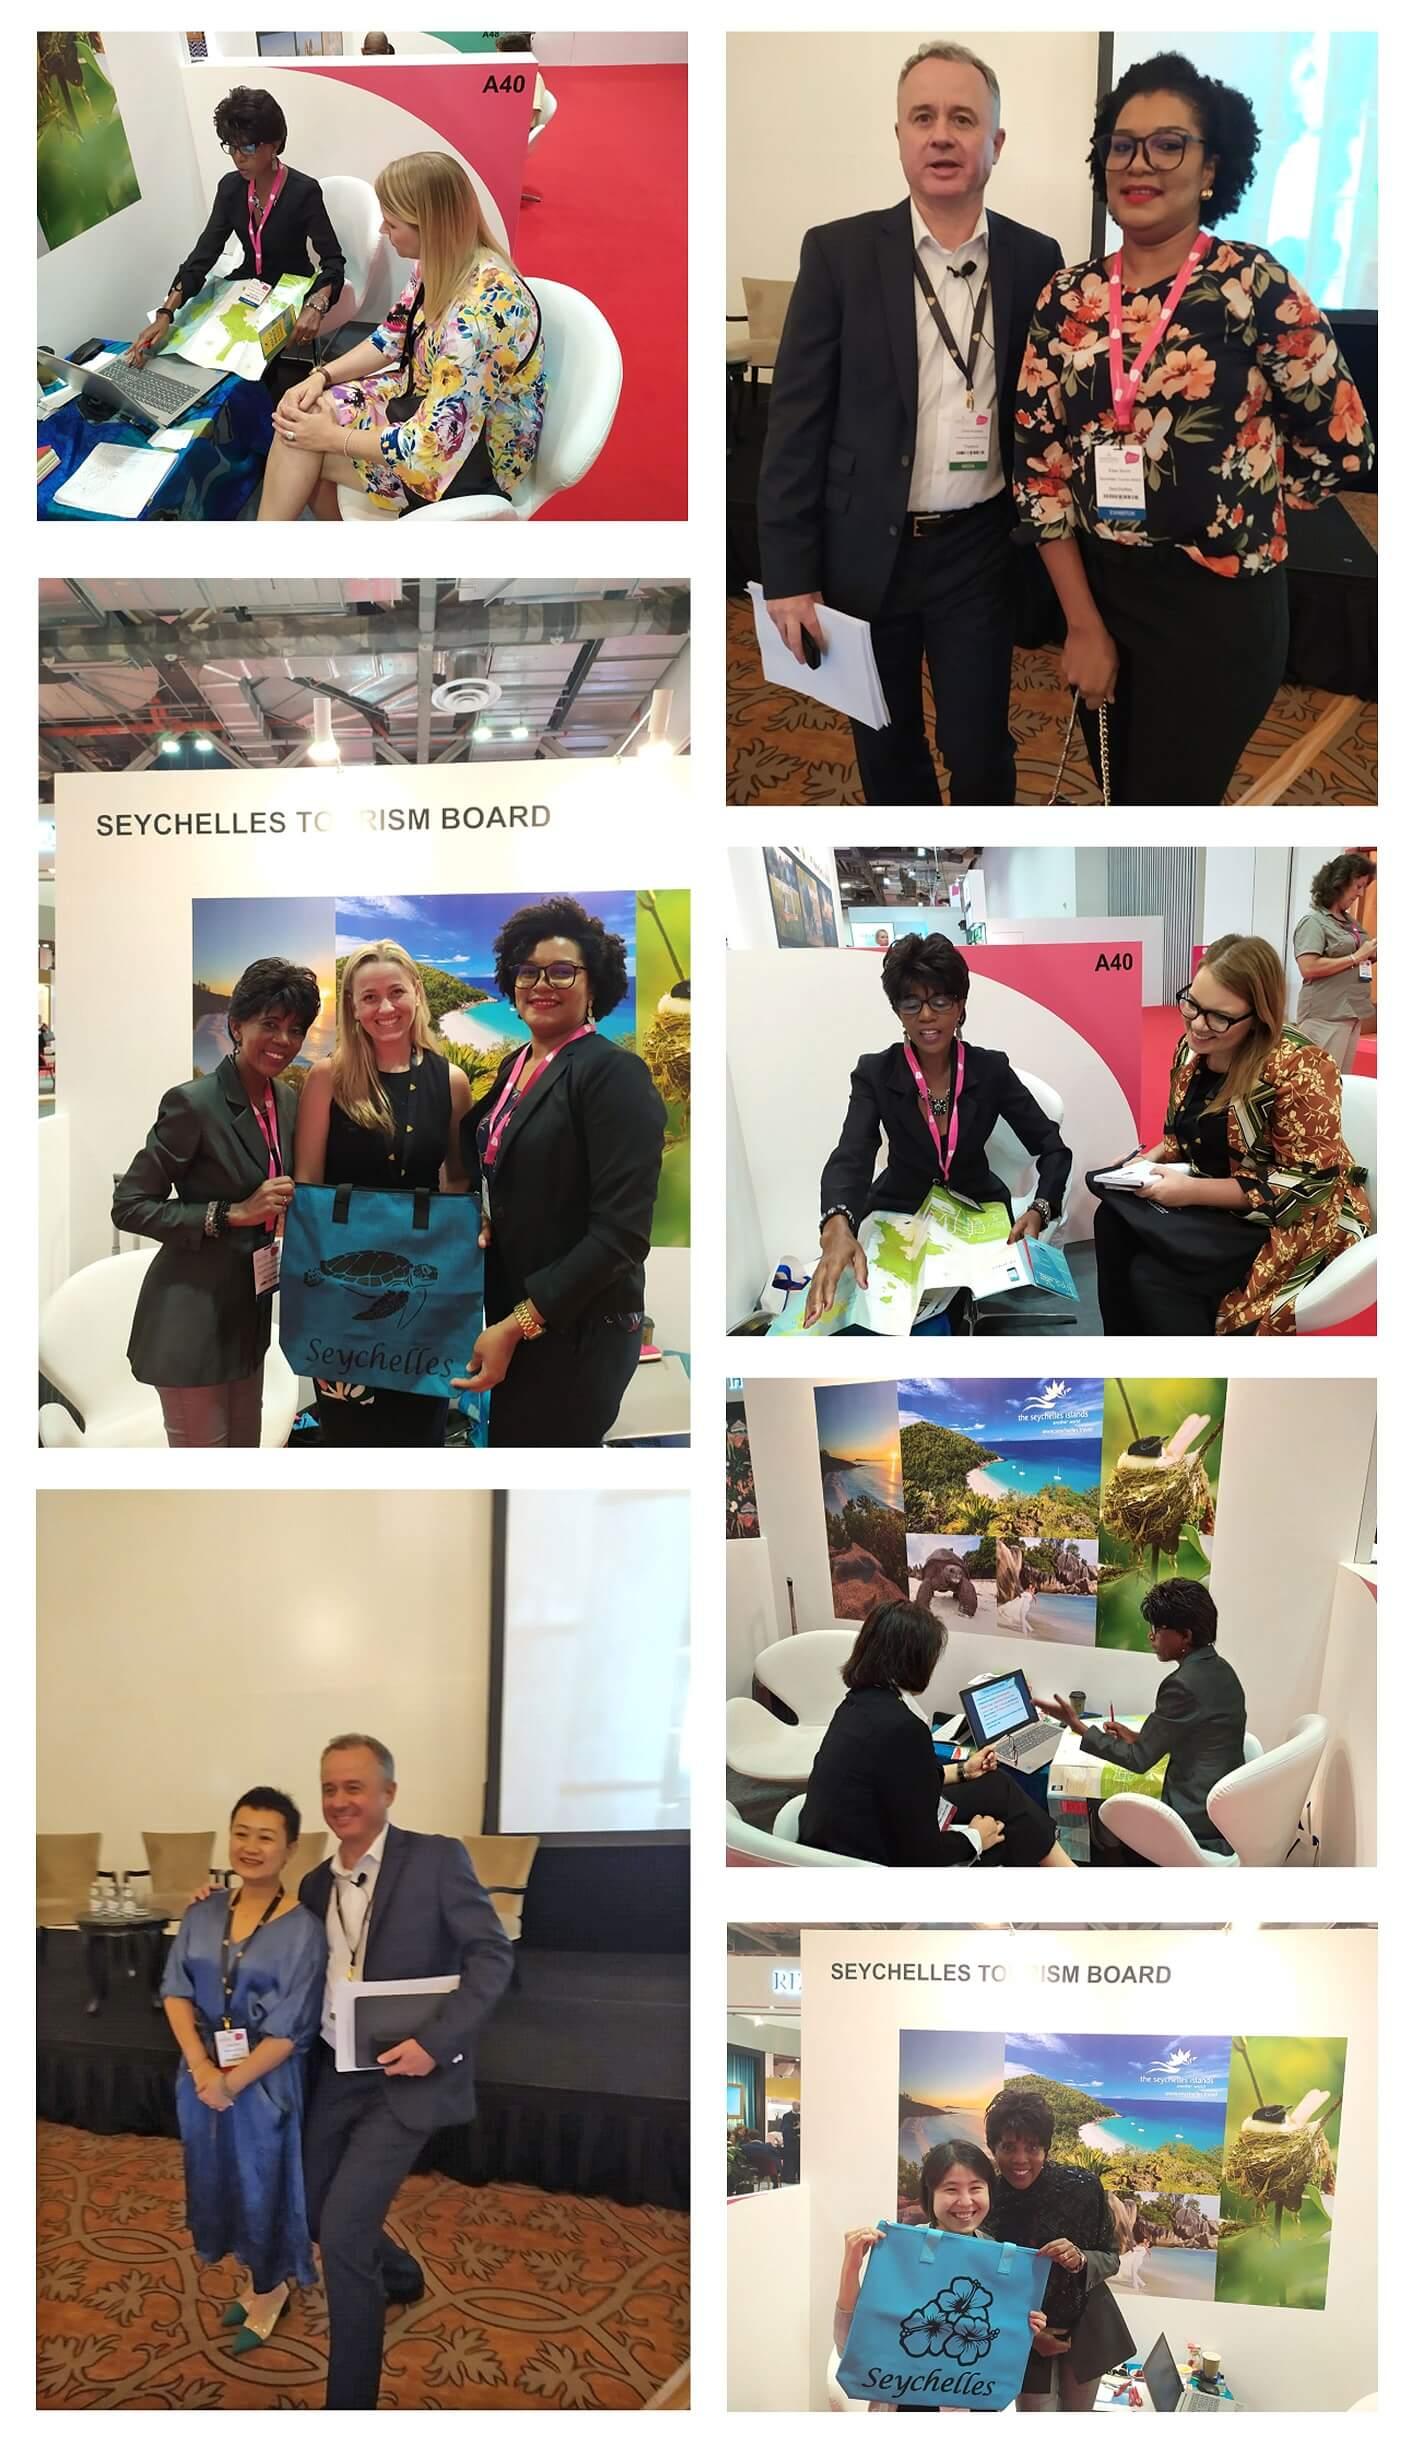 Seychelles Tourism Board attending ILTM Asia-Pacific Fair